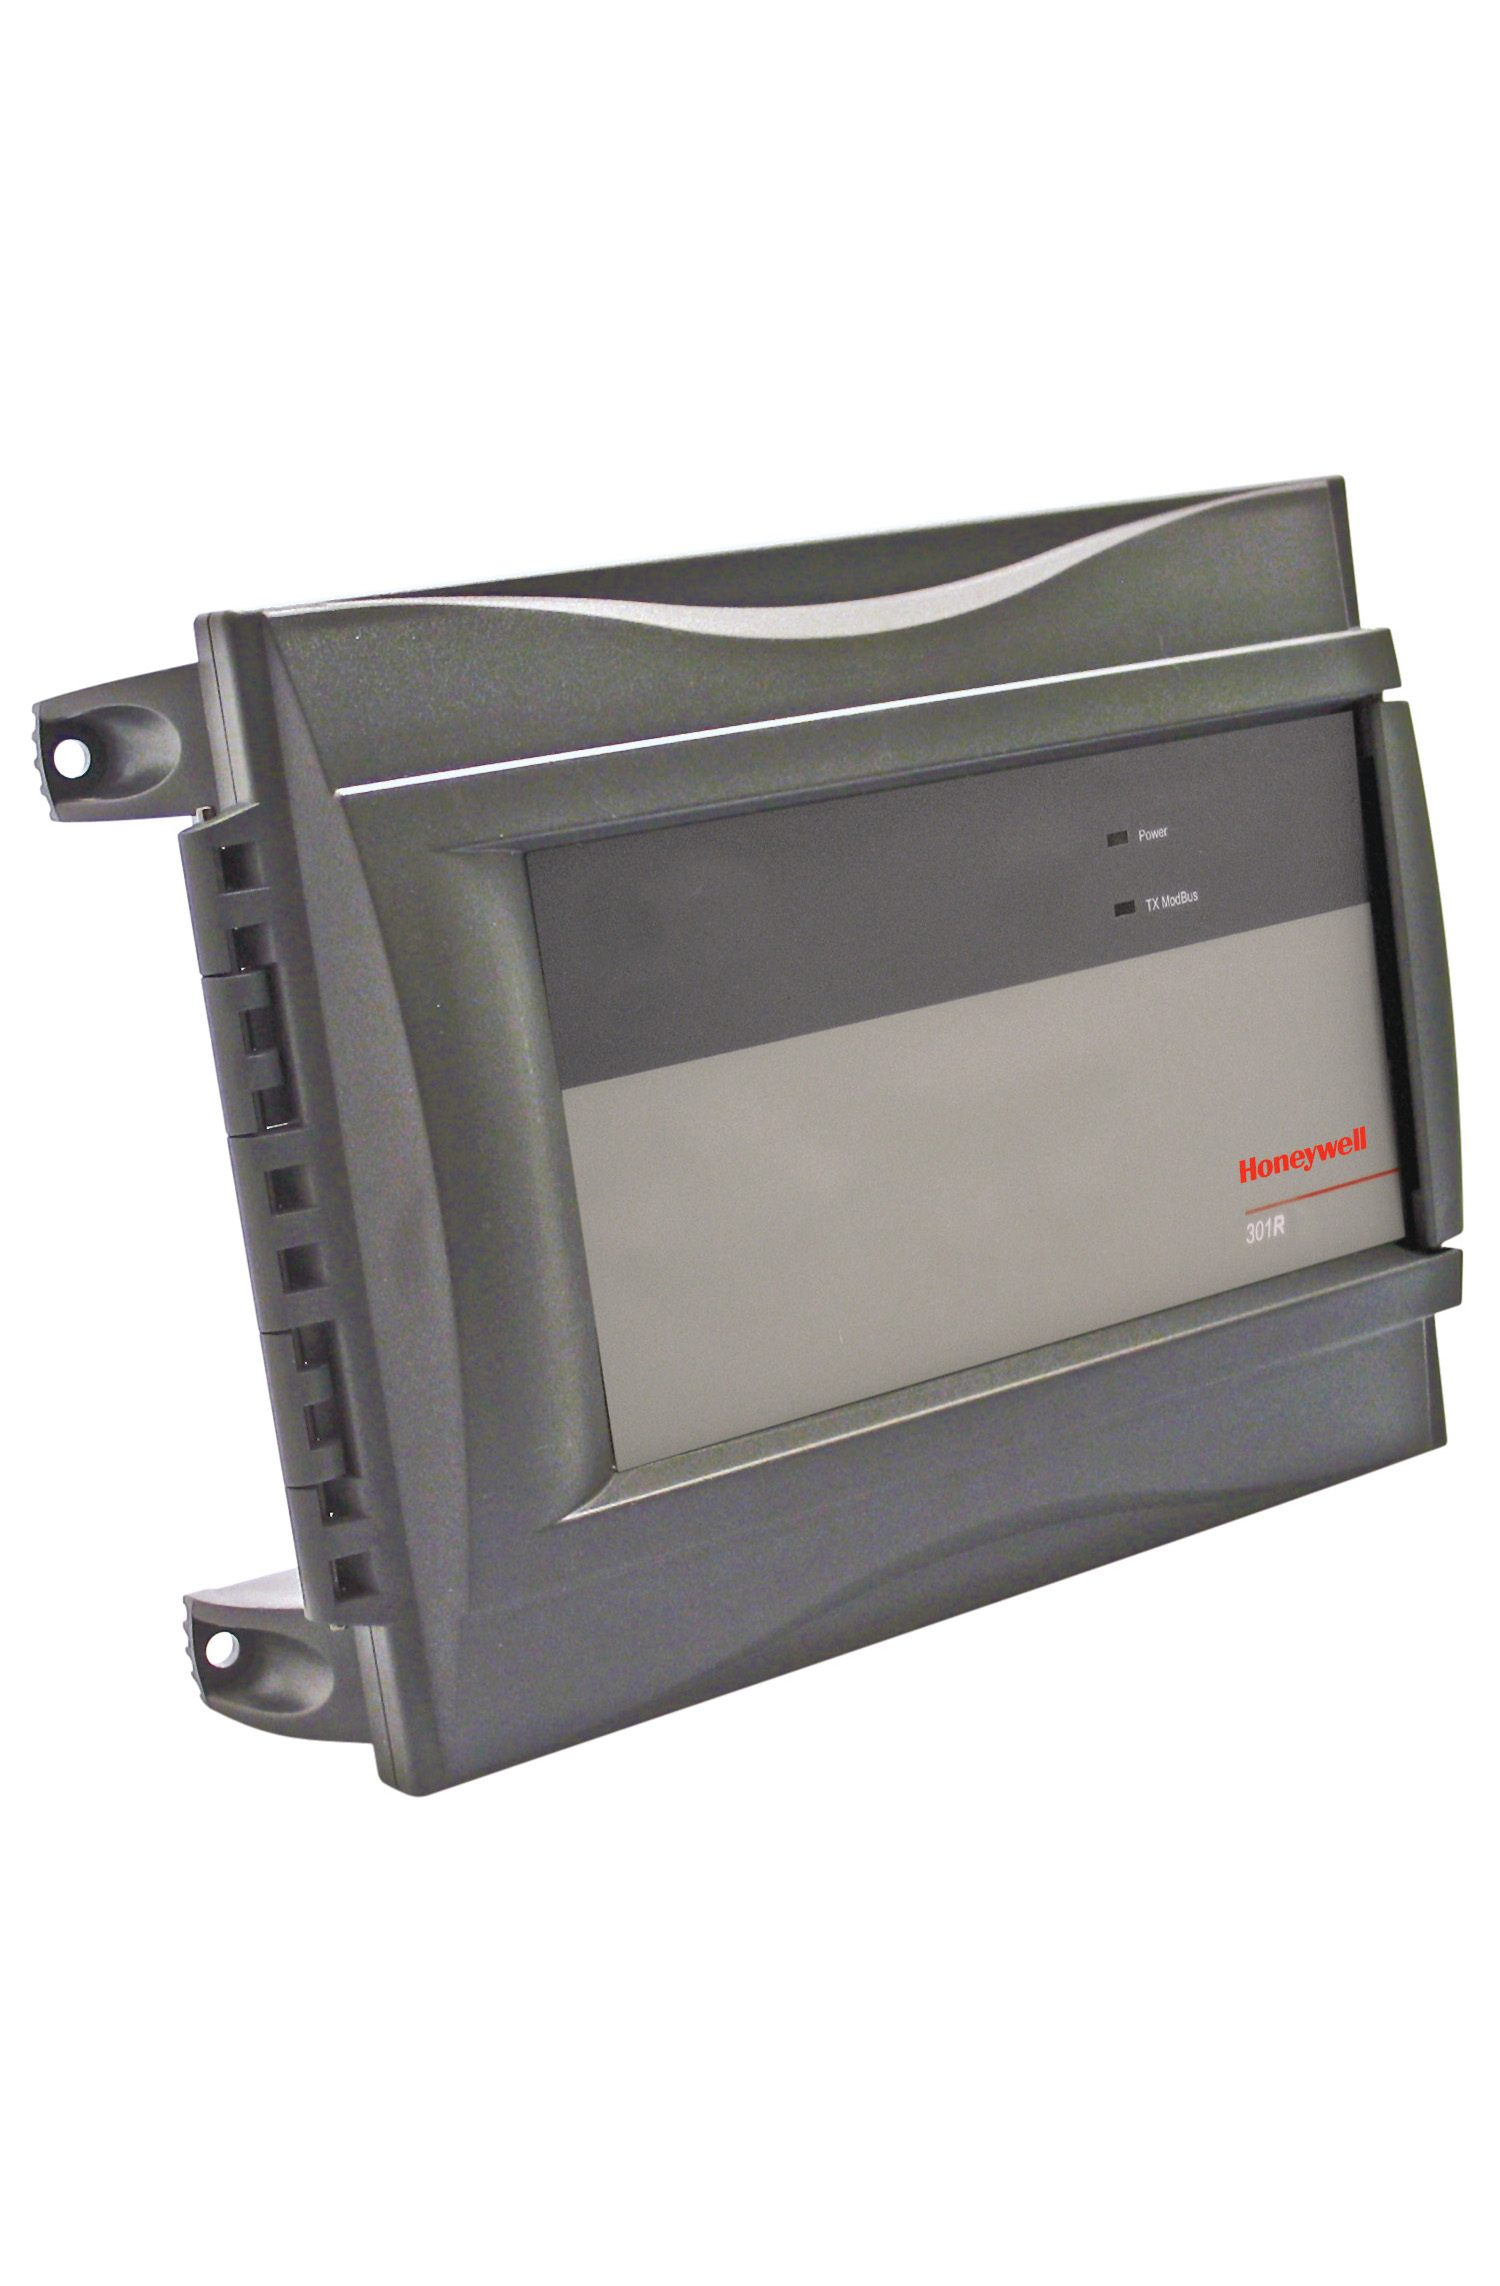 301 R8 Honeywell Analytics Gas Detection